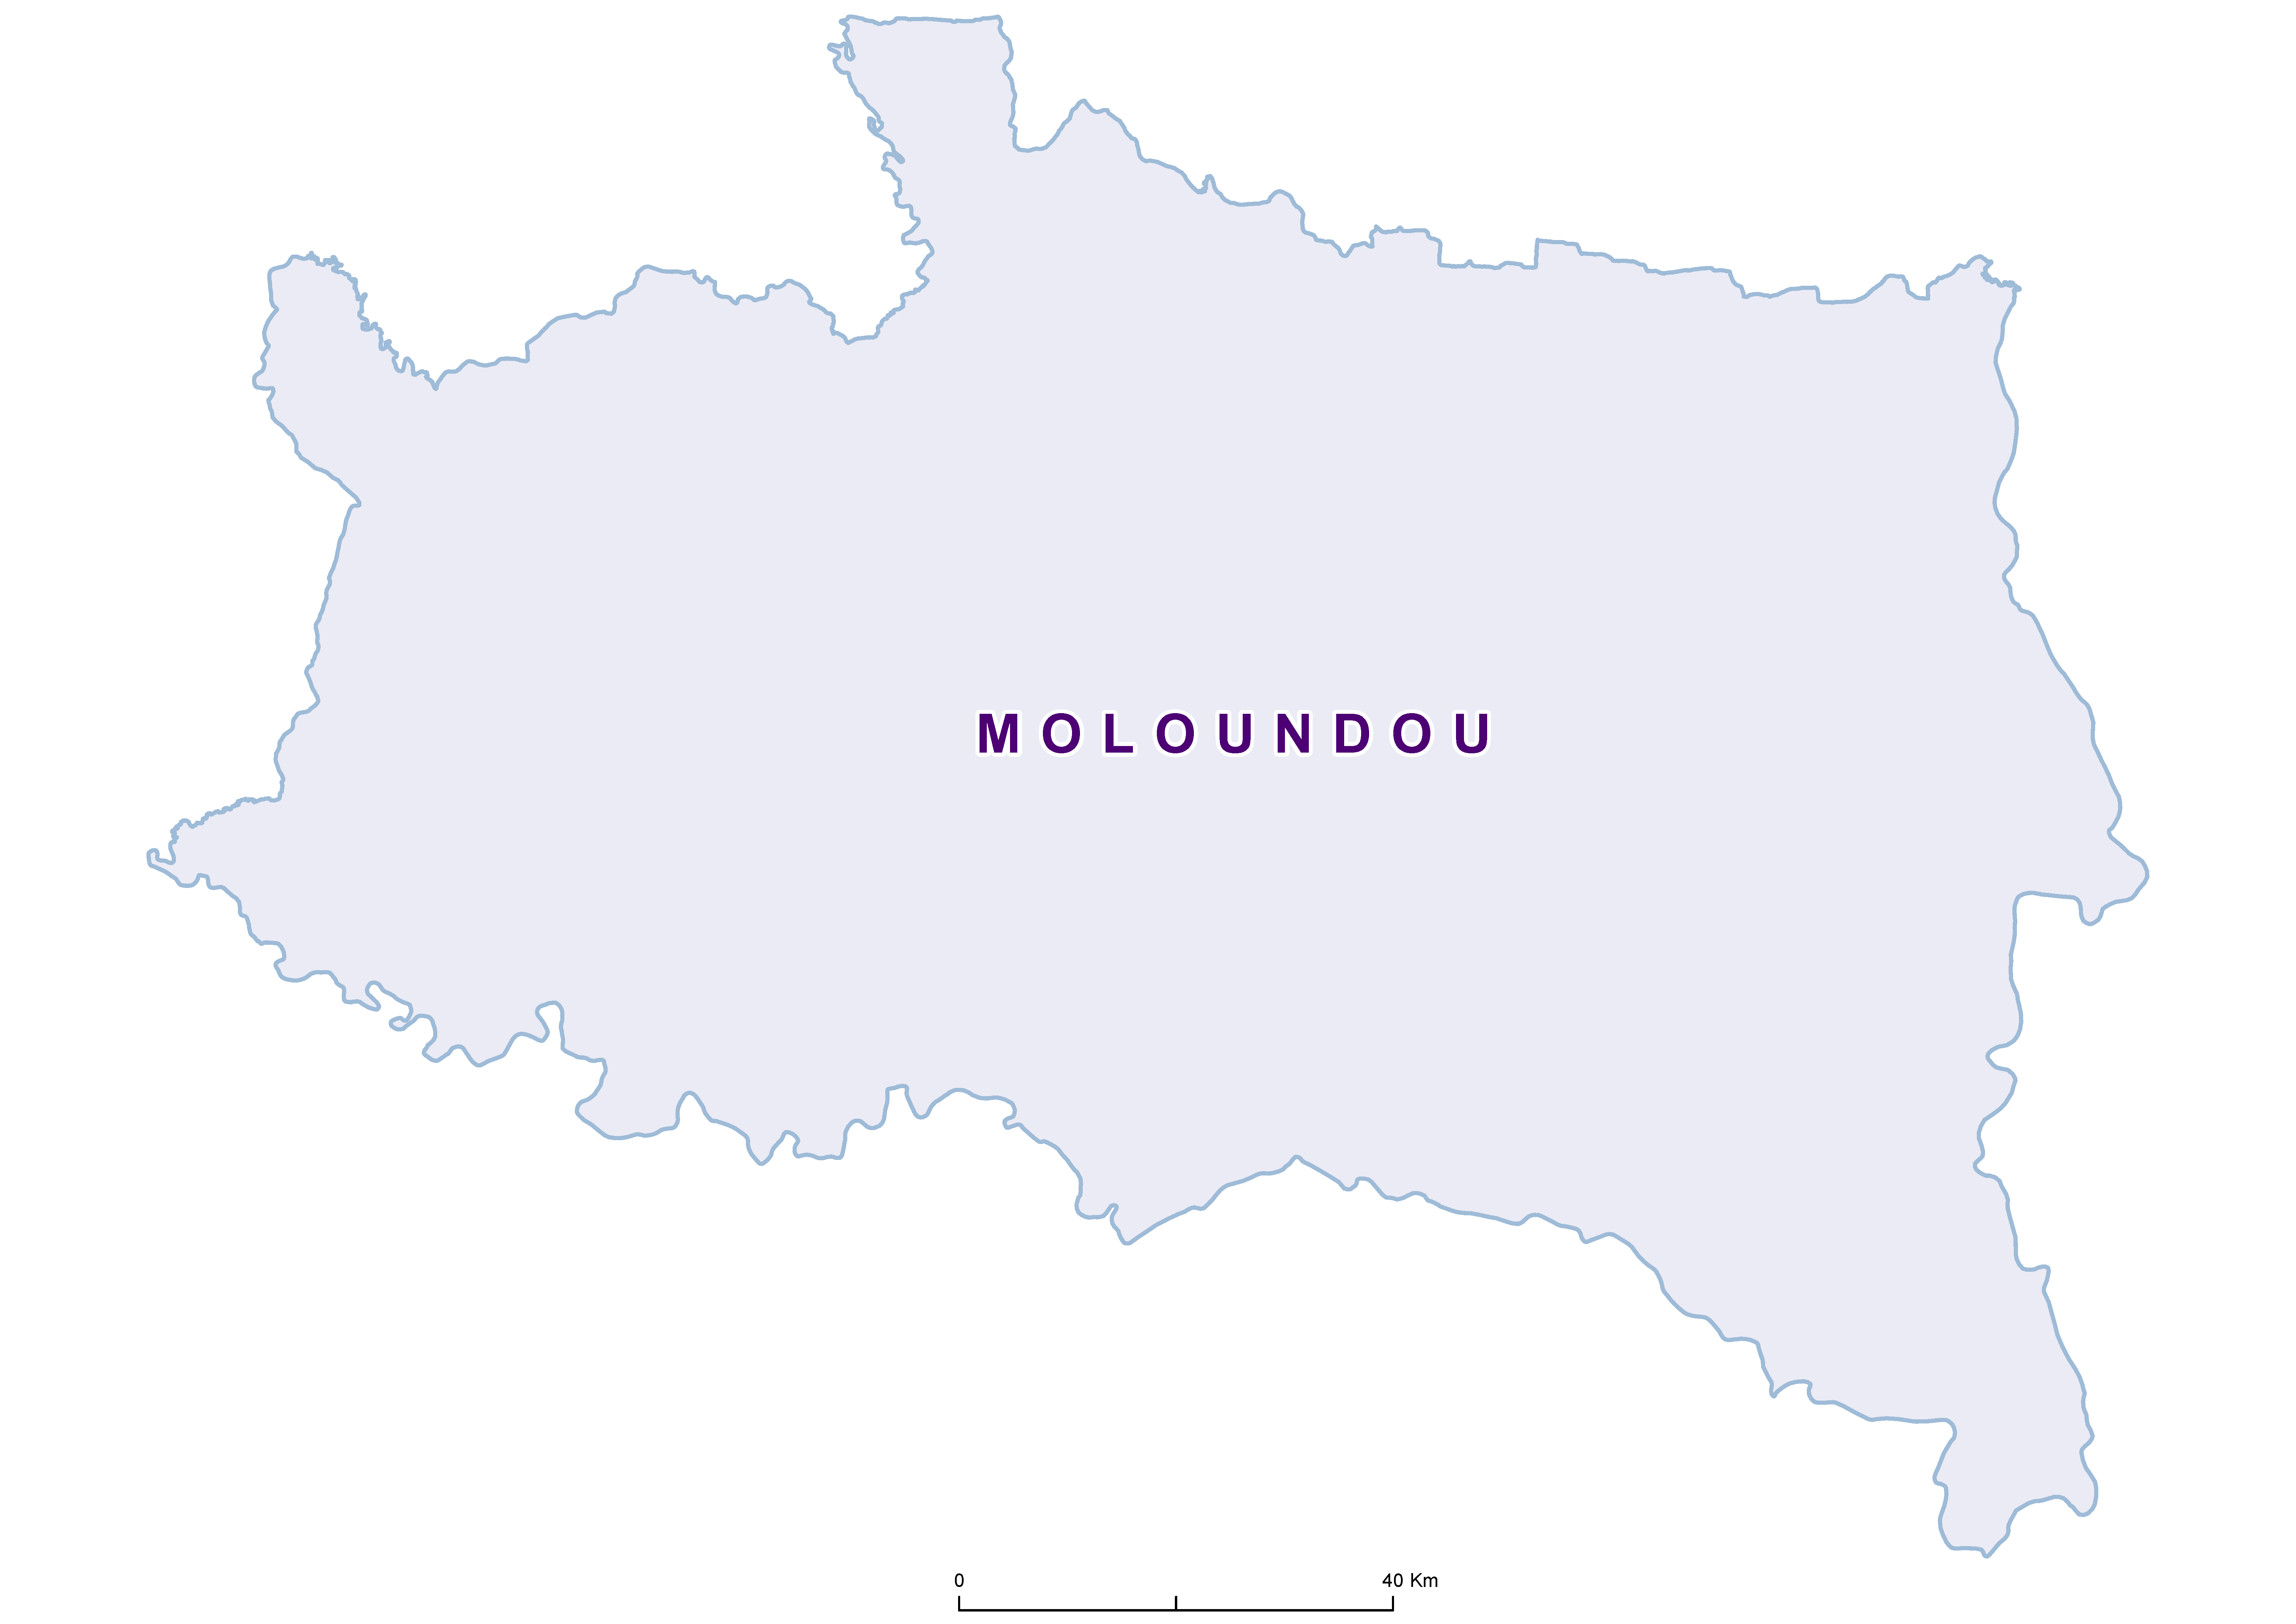 Moloundou Max STH 20180001